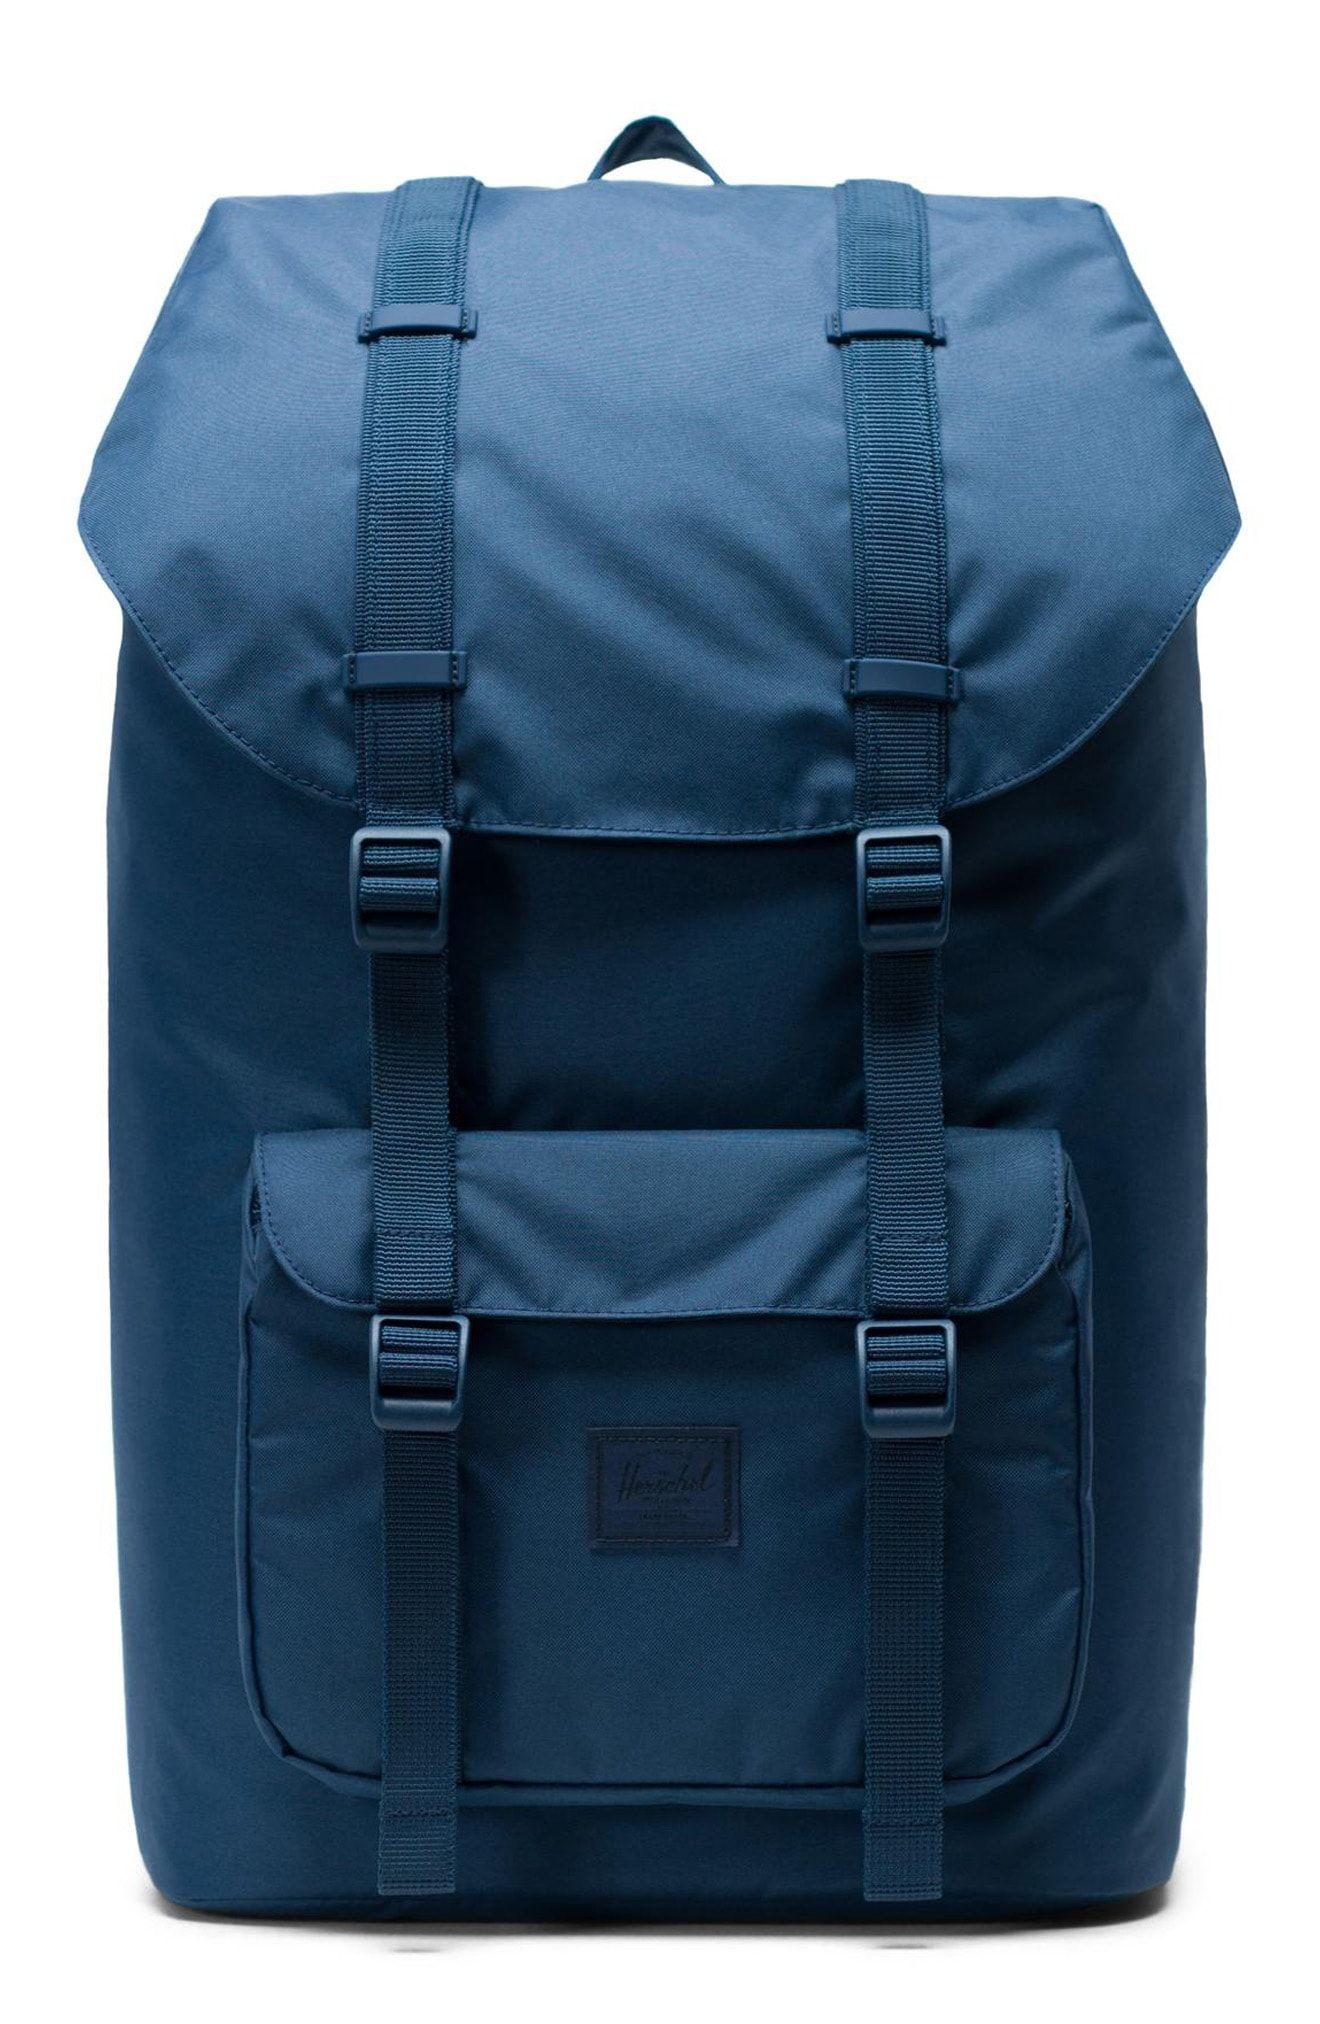 a9258602160 HERSCHEL SUPPLY CO. LITTLE AMERICA LIGHT BACKPACK - BLUE.   herschelsupplyco.  bags  backpacks